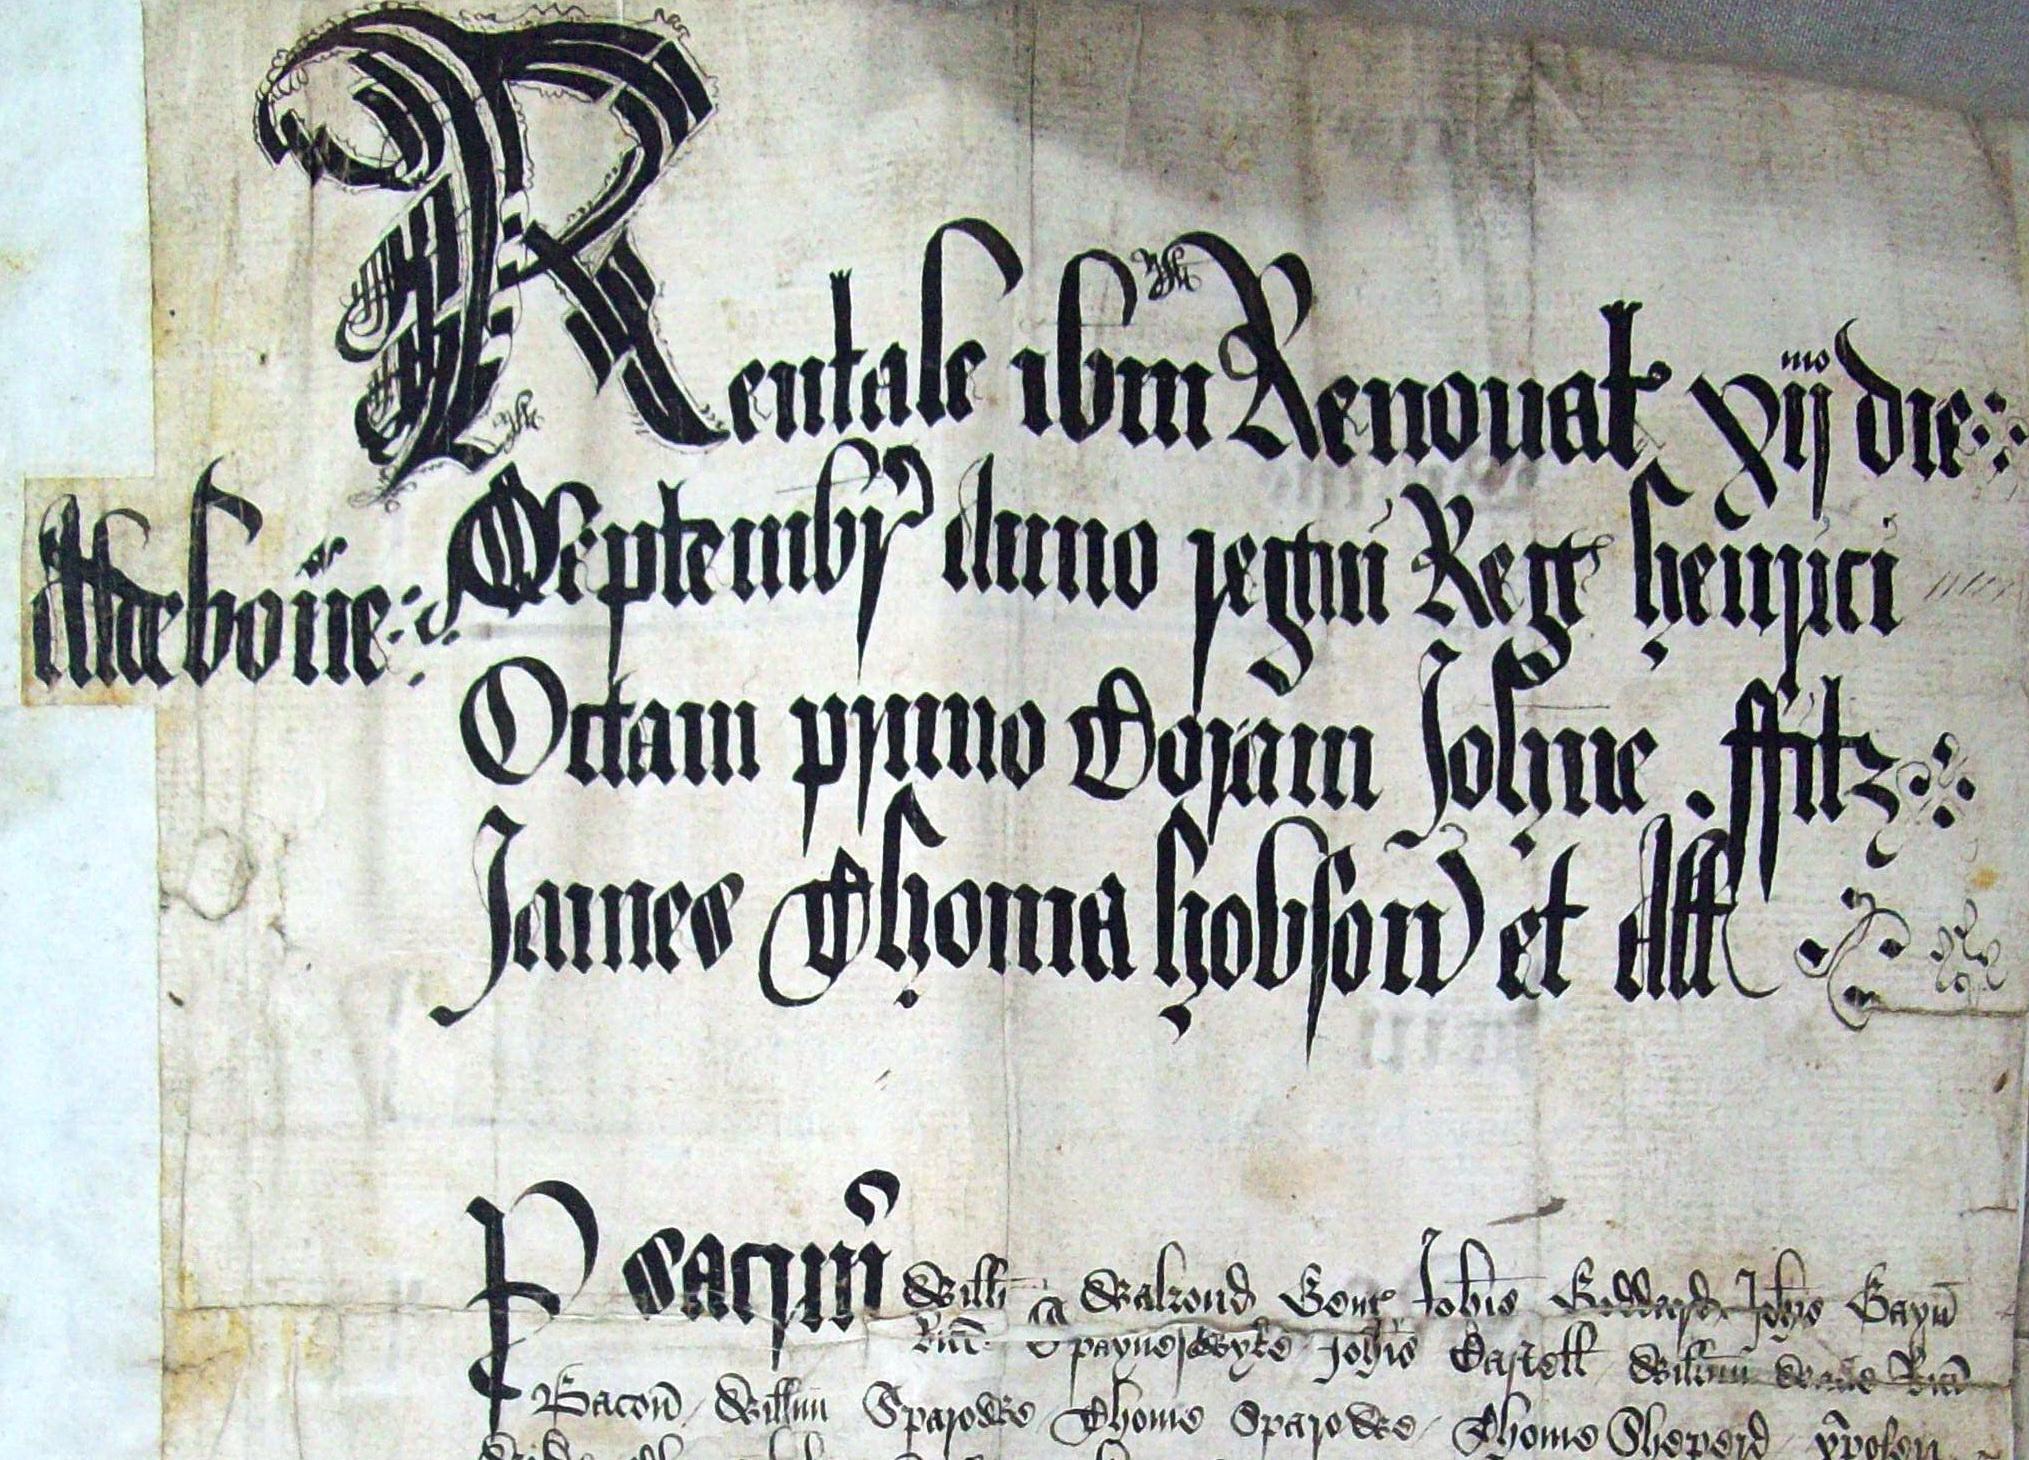 Rent Roll 1509